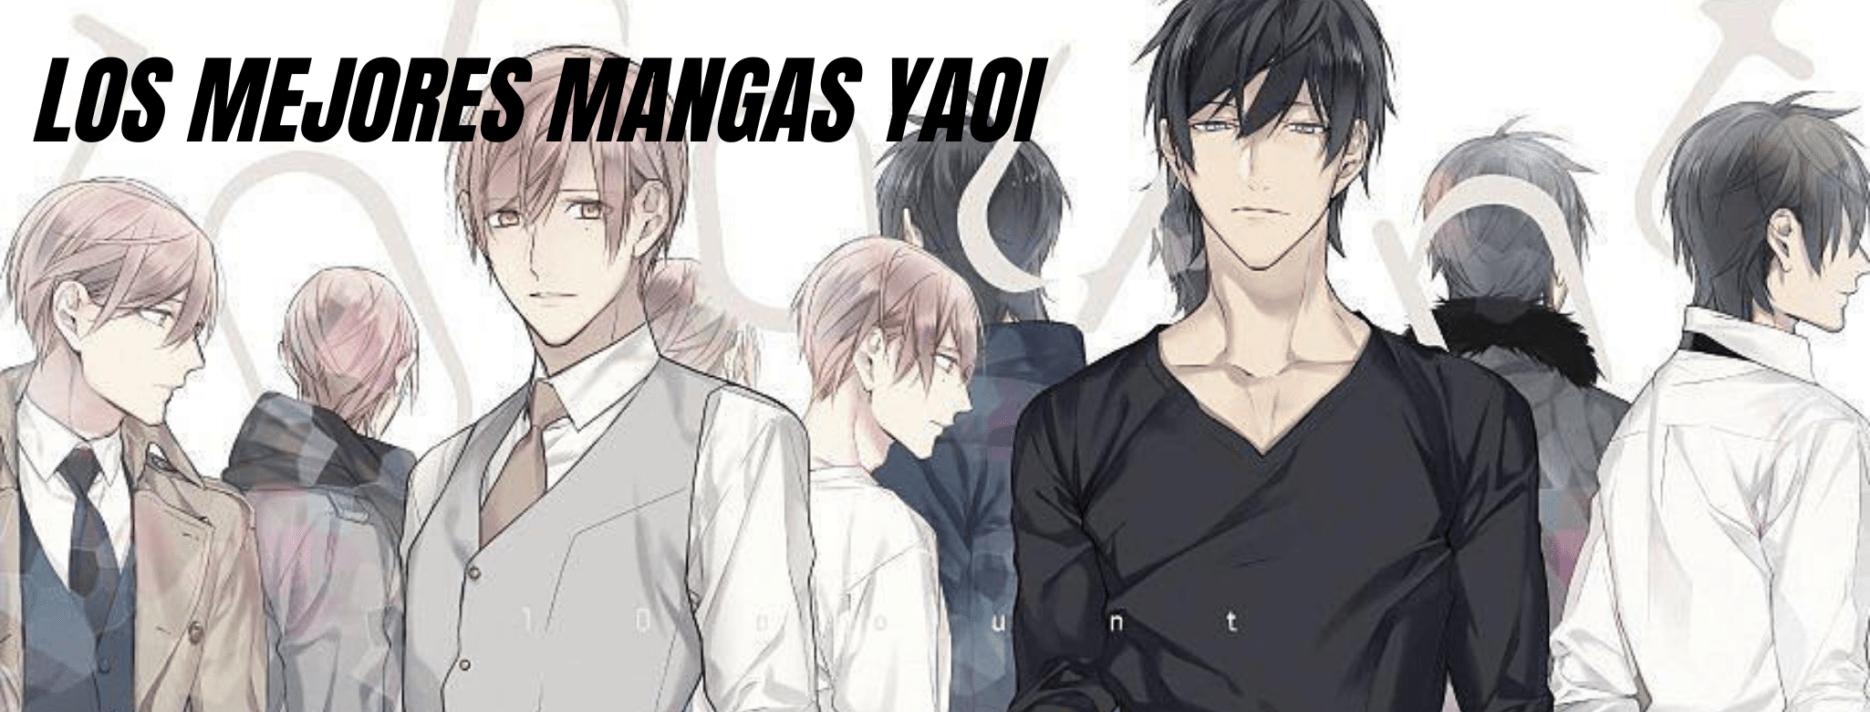 Los Mejores Mangas Yaoi